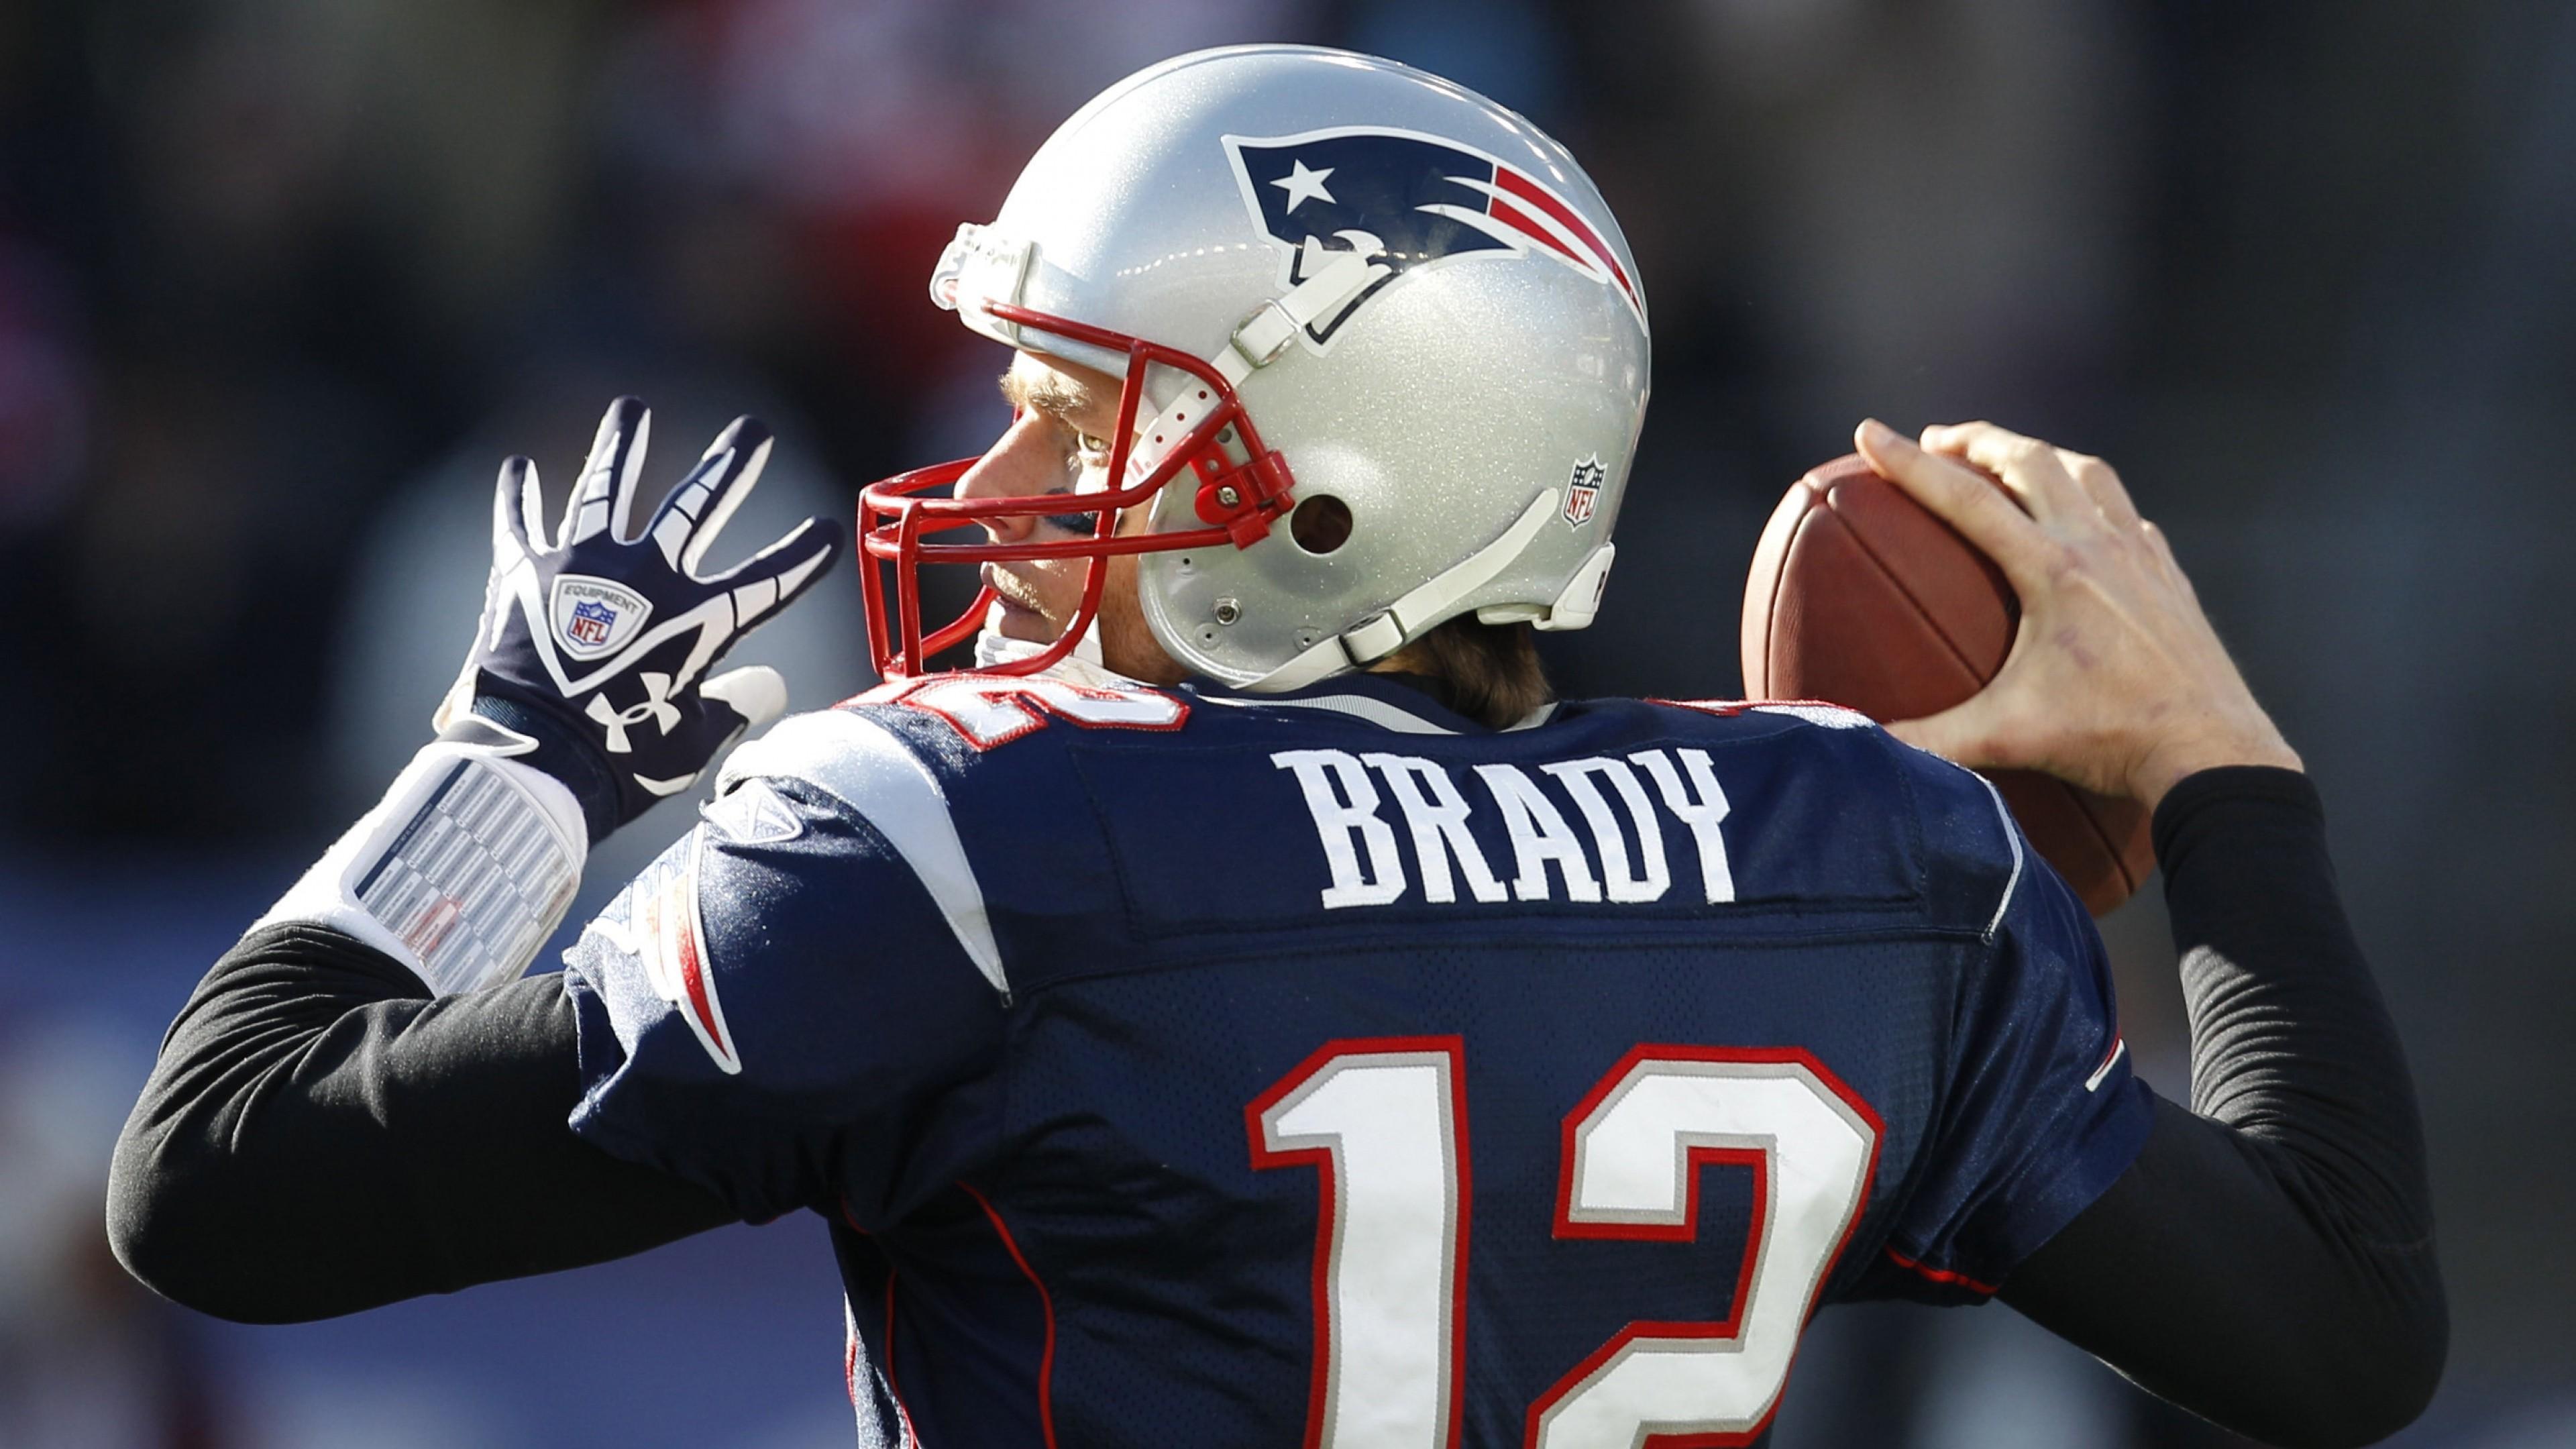 New England Patriots Screensaver Wallpaper (68+ Images